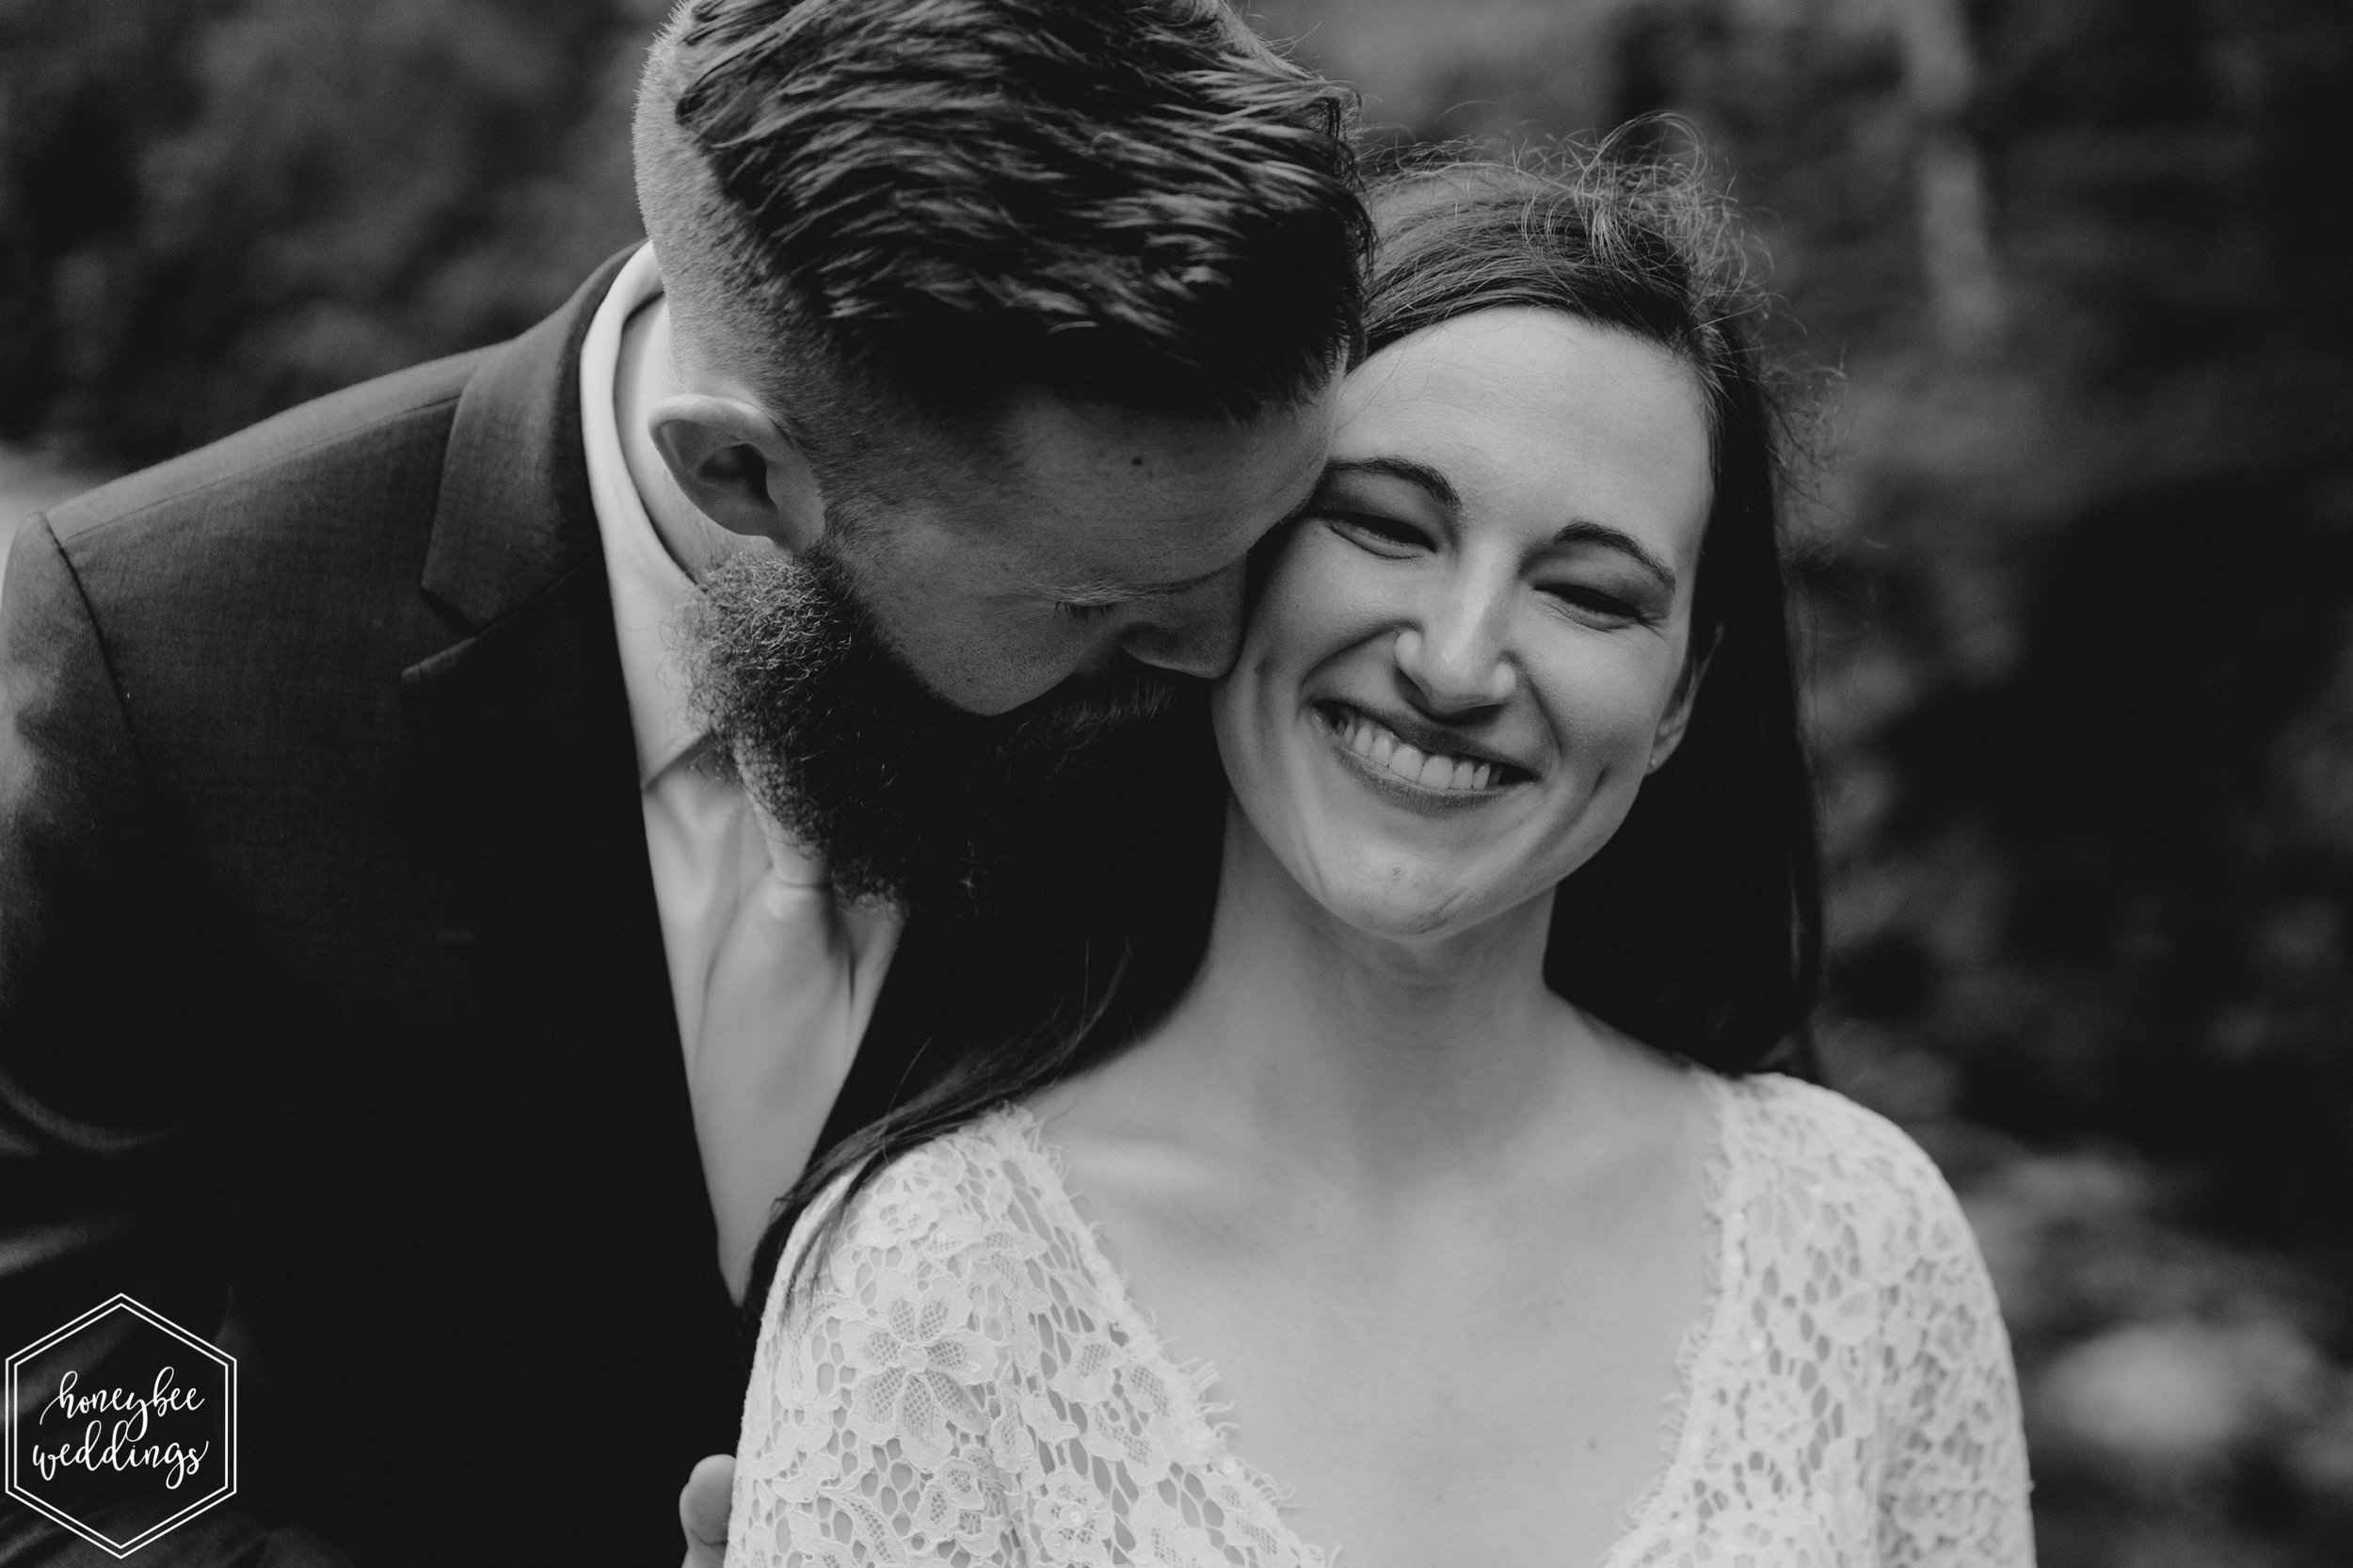 255Glacier National Park Wedding_Izaak Walton Inn Wedding_Honeybee Weddings_Norah & Kyle_June 09, 2019-83.jpg